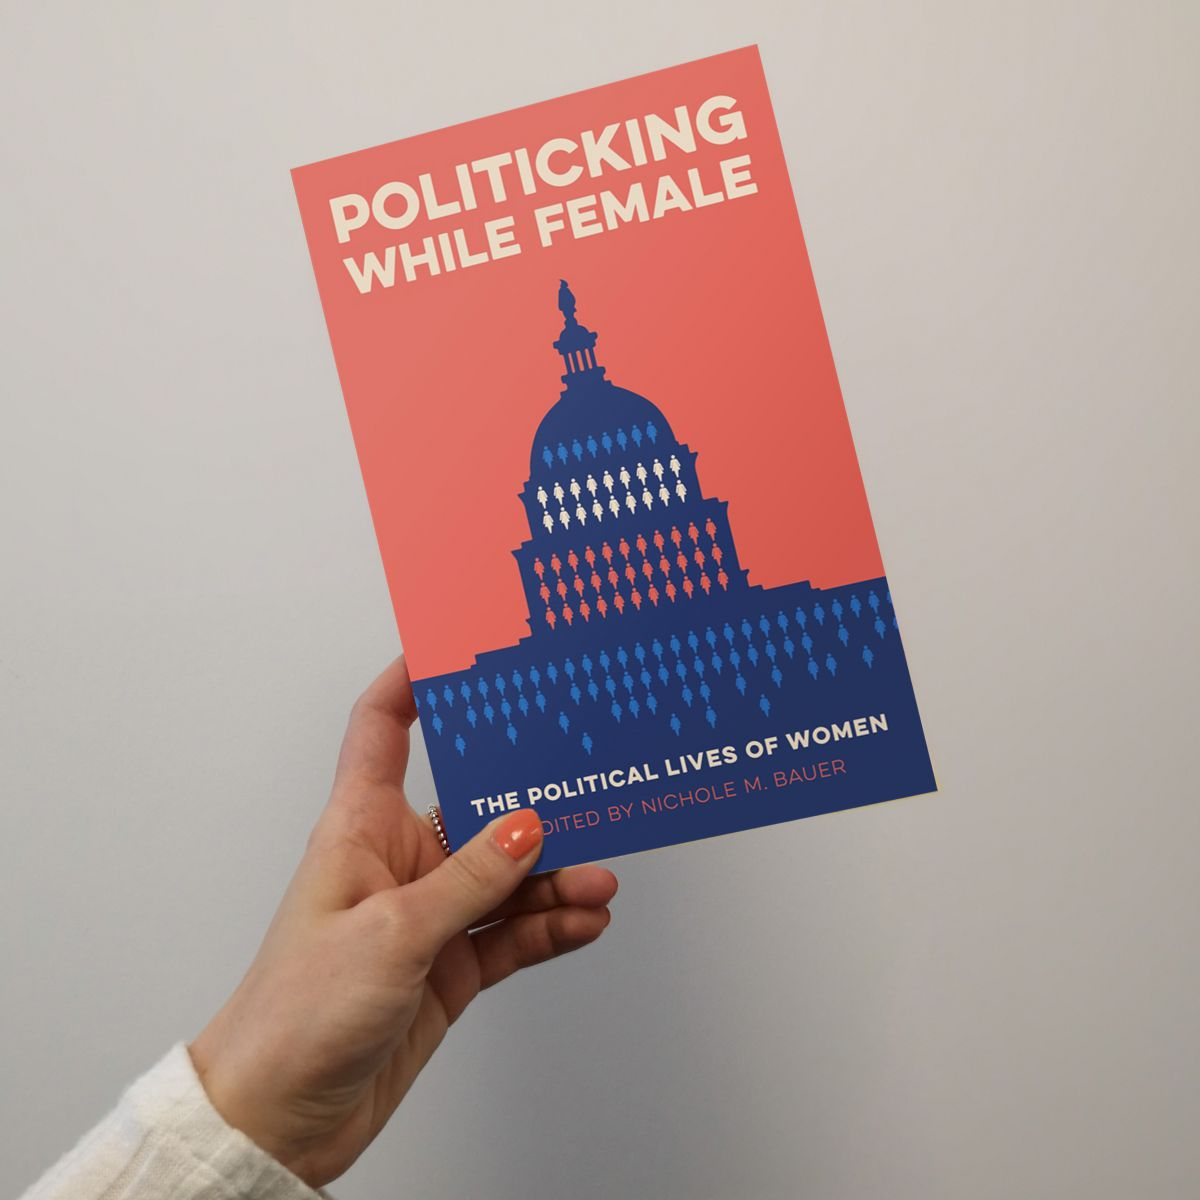 politicking-while-female